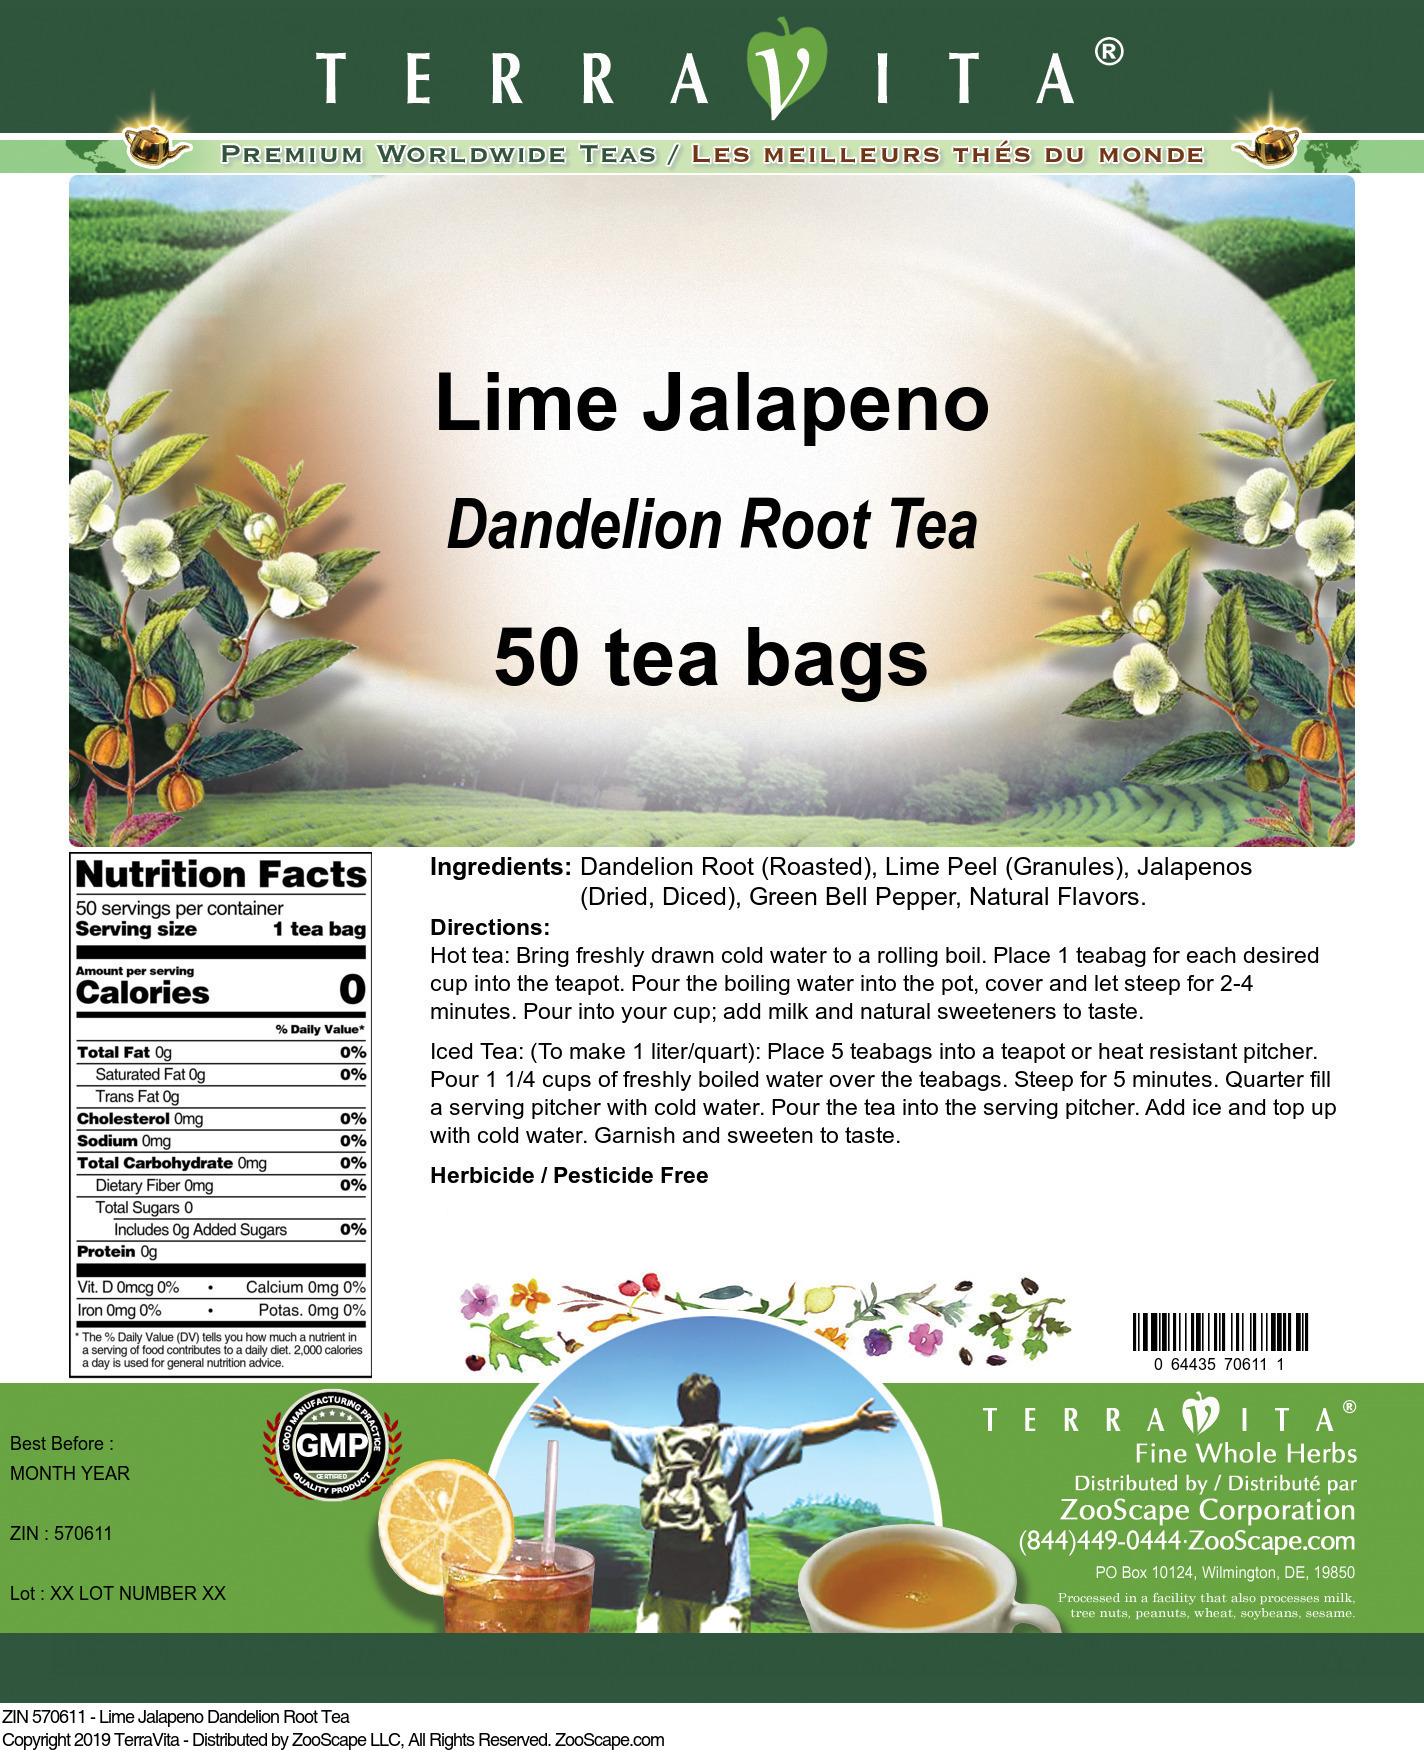 Lime Jalapeno Dandelion Root Tea